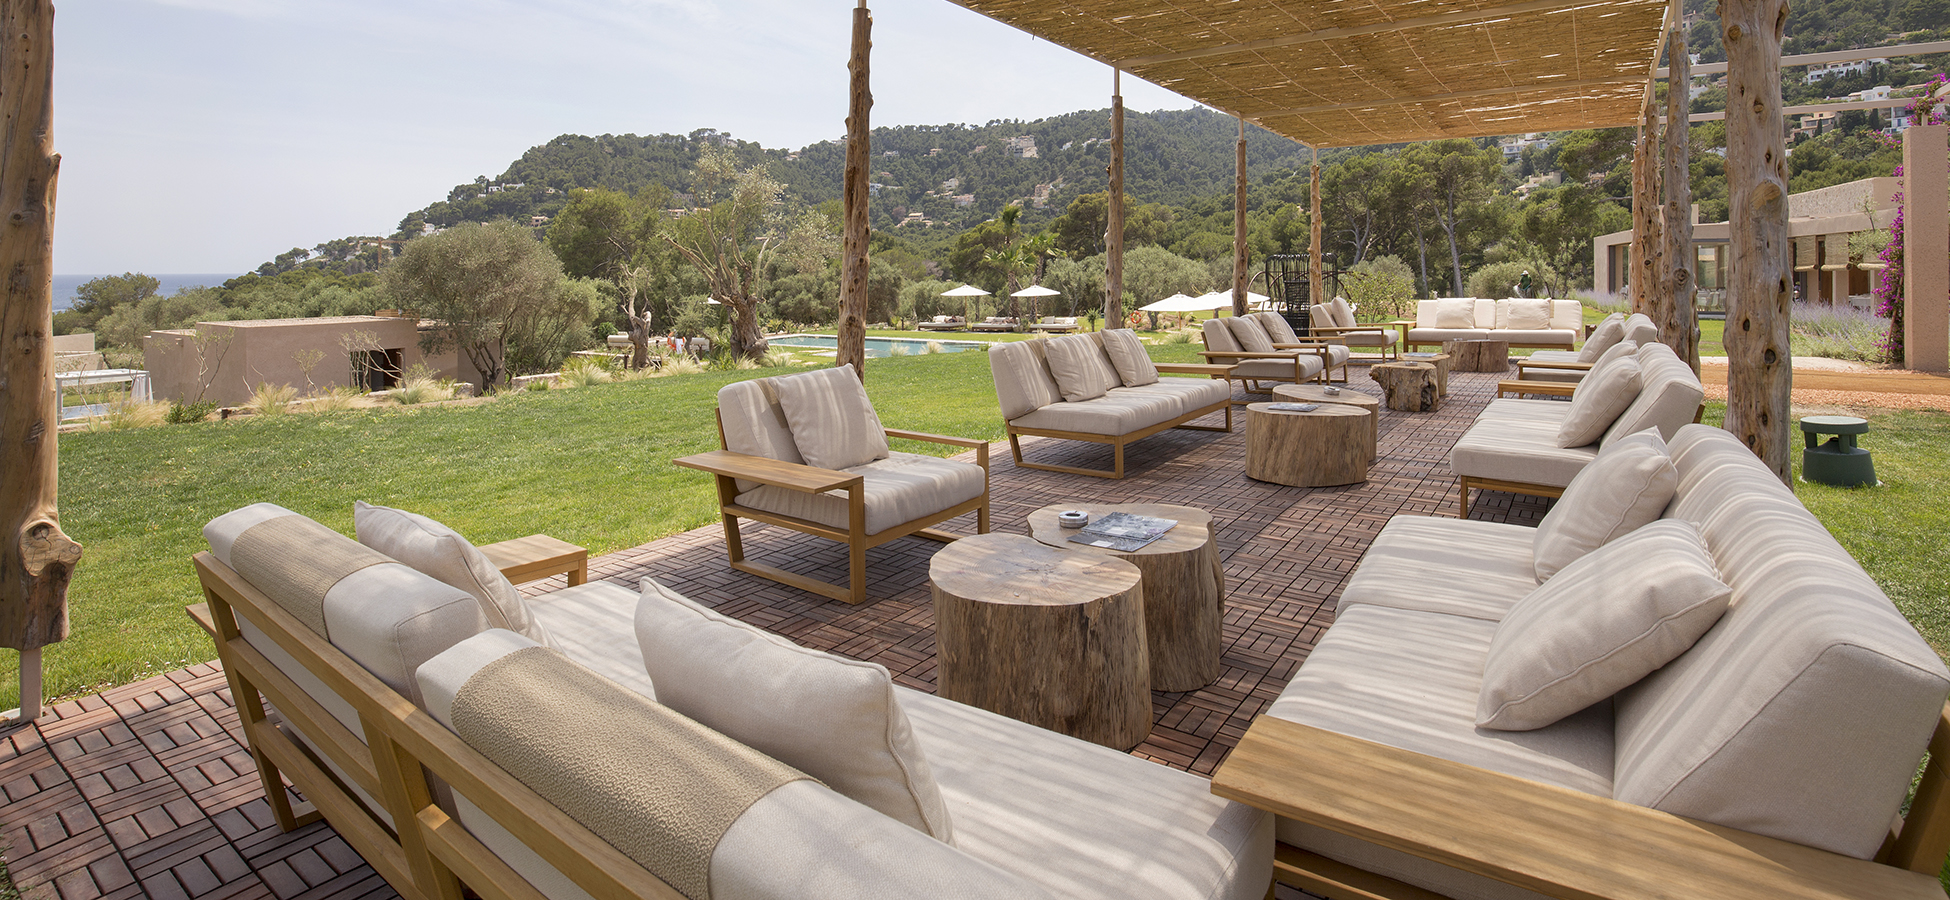 point outdoor furniture design